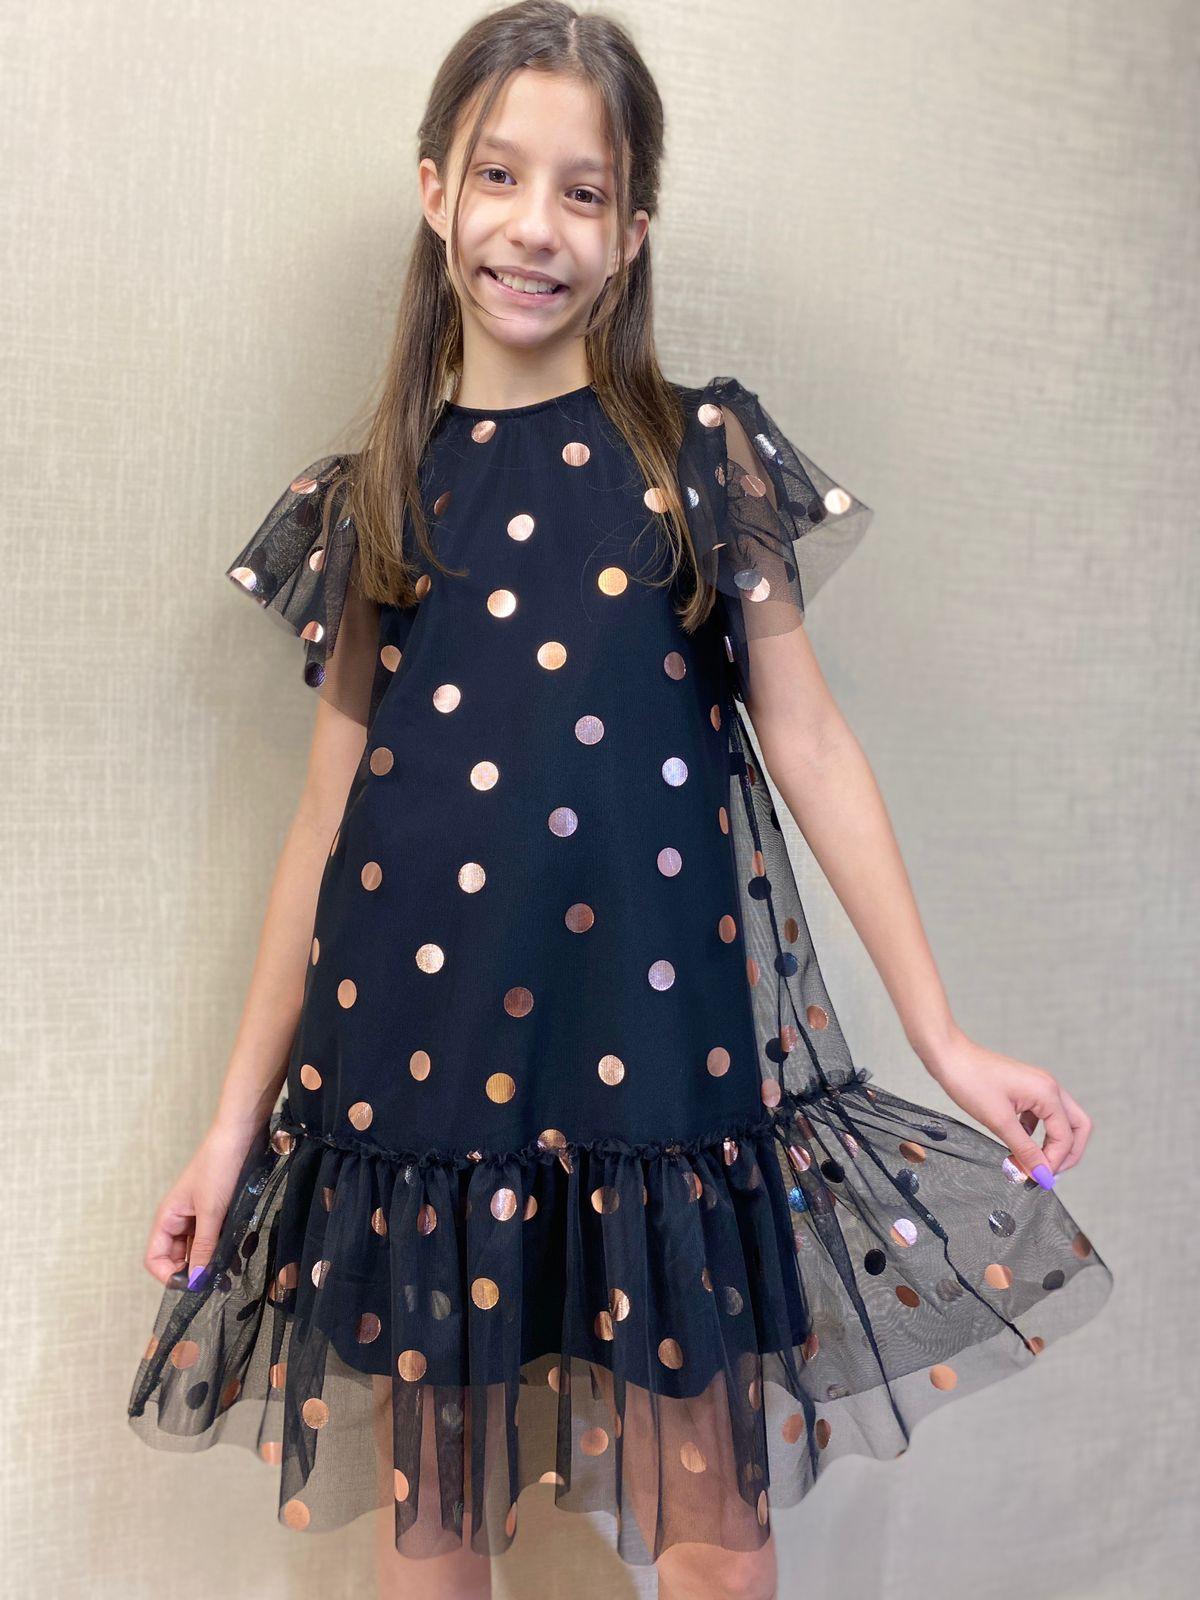 Vestido infantil tule e poá - Tam 06 a 12 anos